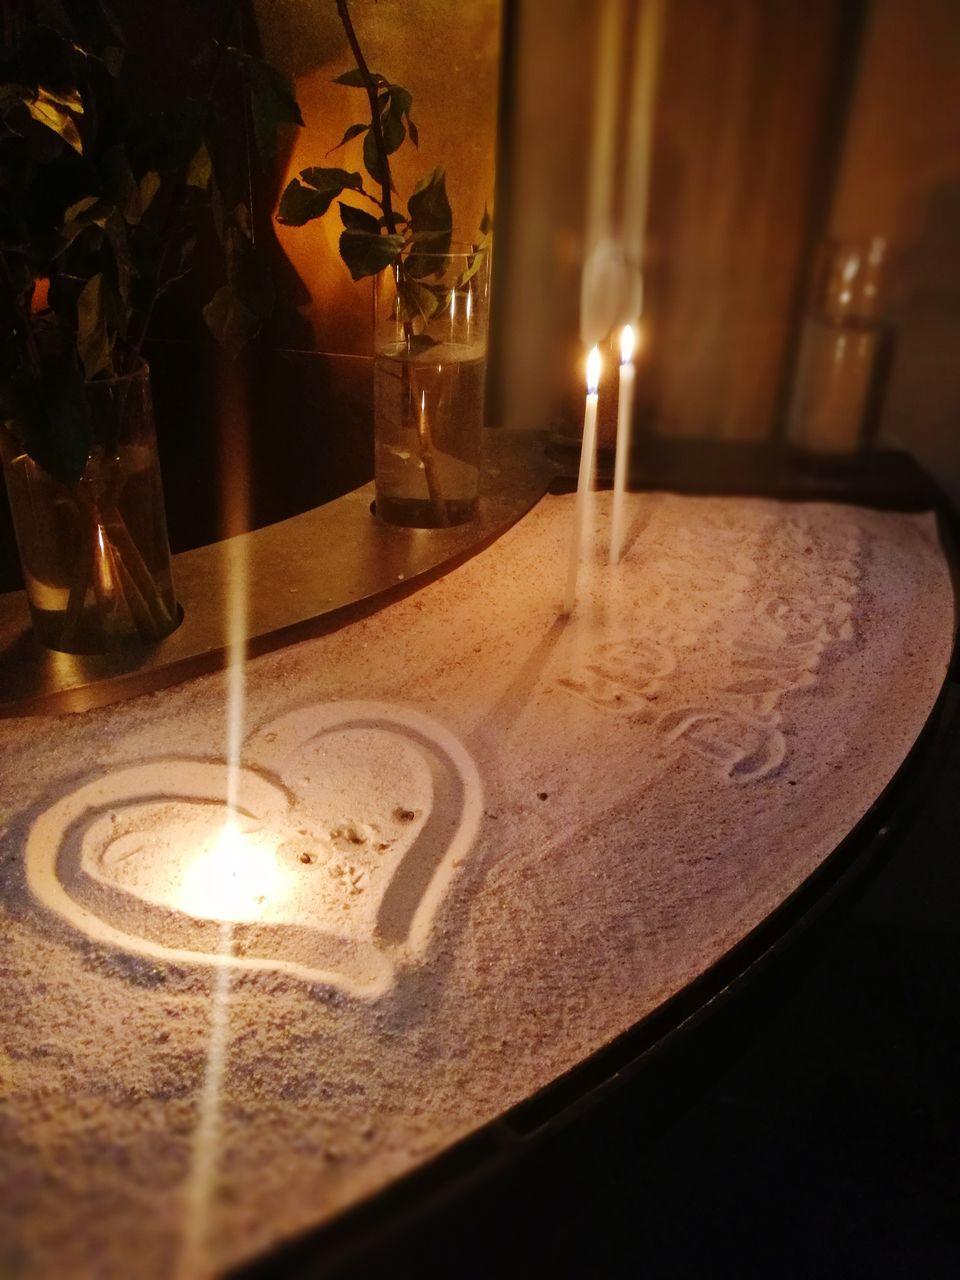 candle, flame, burning, heat - temperature, indoors, glowing, table, illuminated, tea light, no people, close-up, oil lamp, night, diya - oil lamp